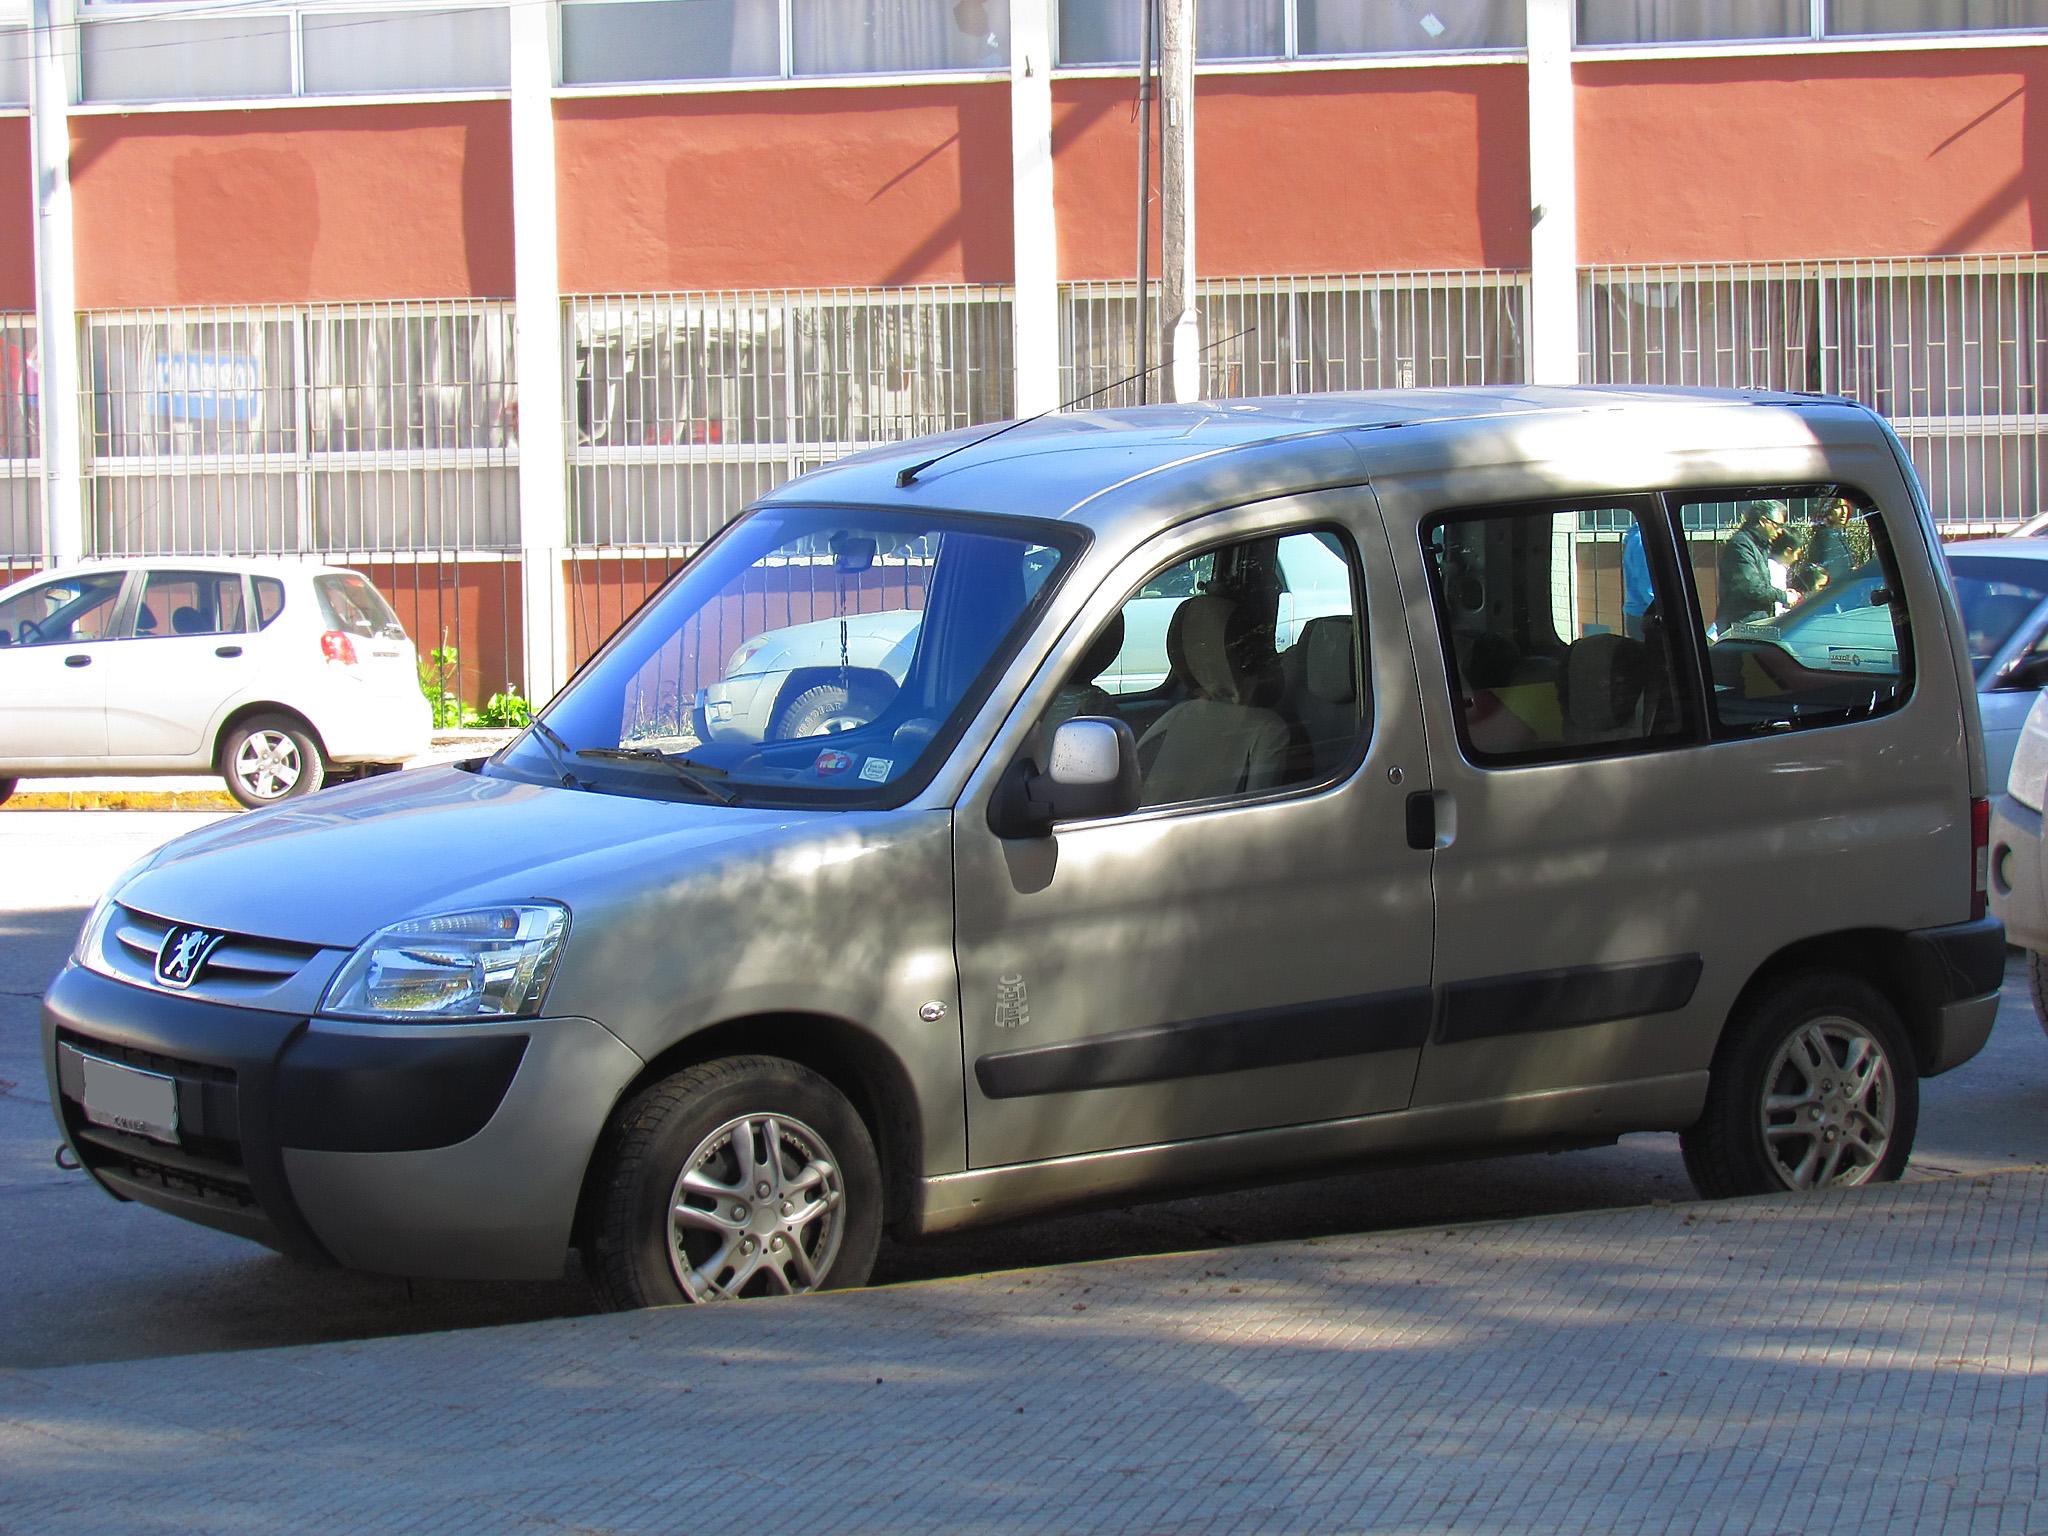 47f3b3f2ea3 File:Peugeot Partner 1.6 HDi Totem 2008 (10750759753).jpg ...